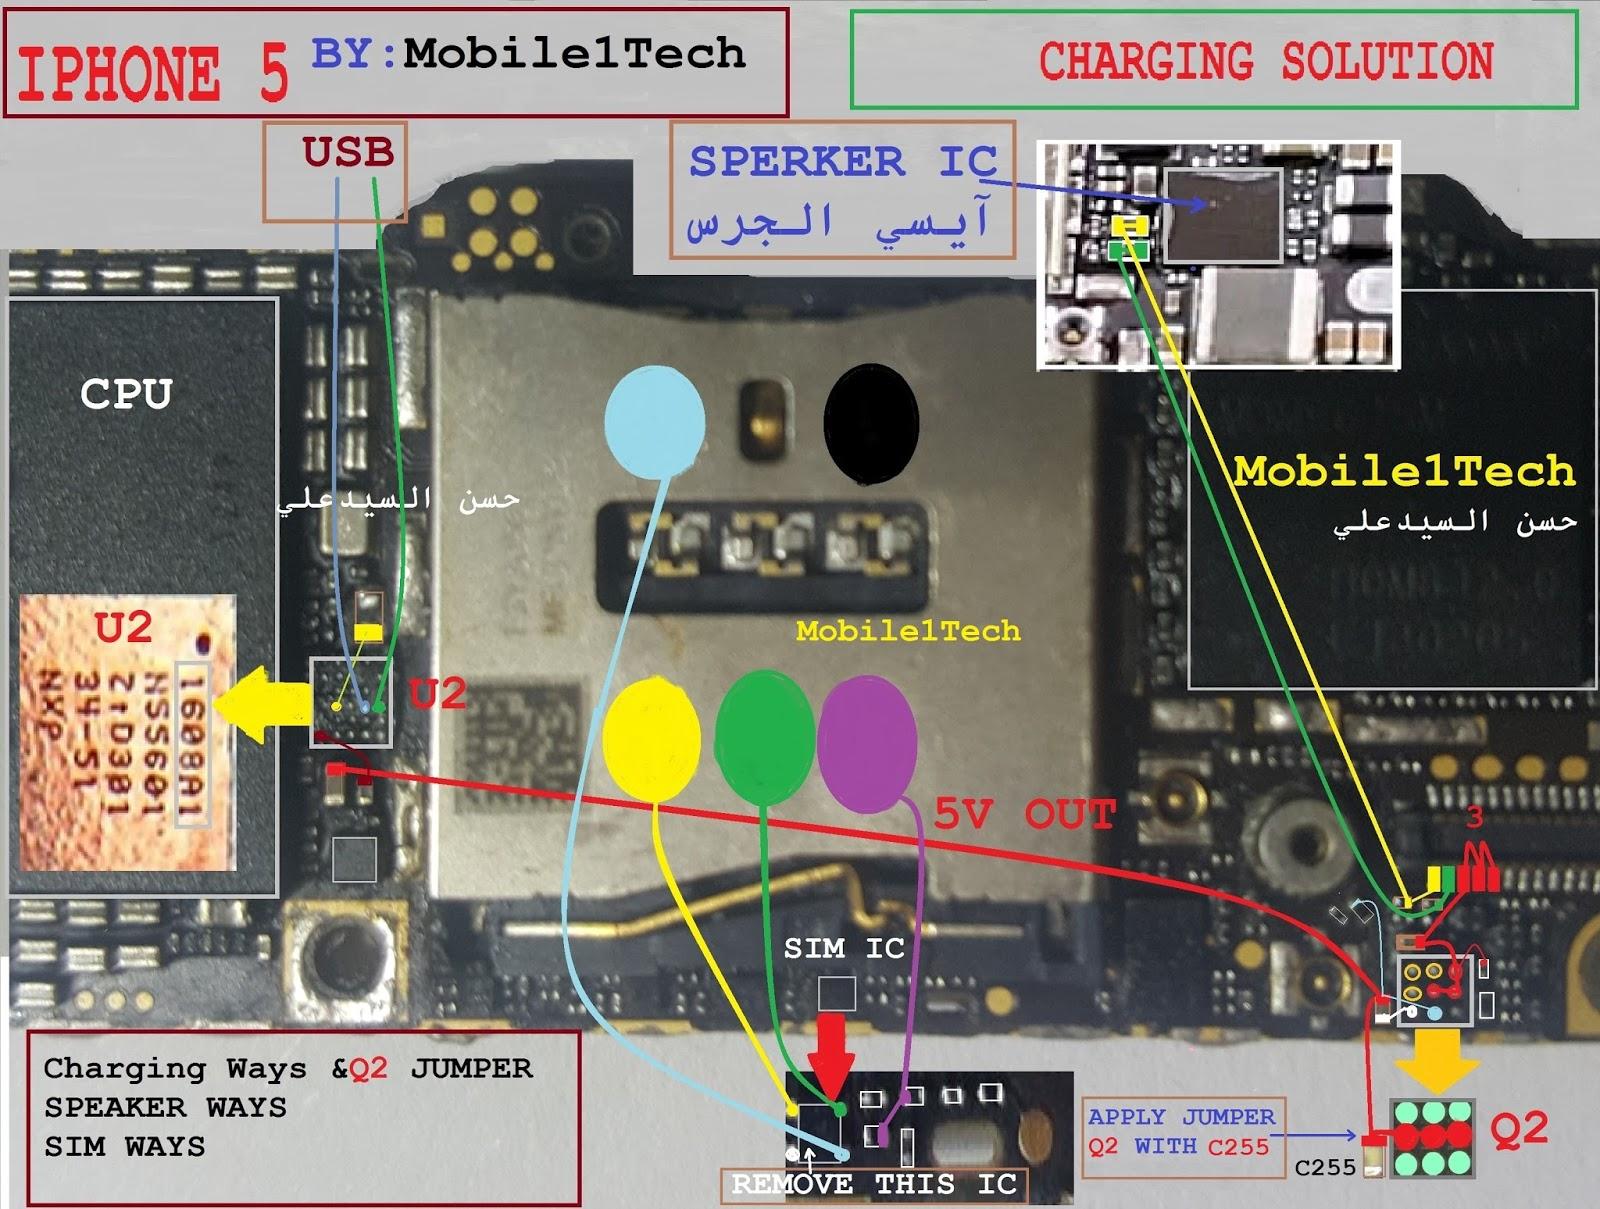 Plug Power Q2 Vw Golf Mk1 Headlight Wiring Diagram Iphone 5 Usb Charging Problem Solution Jumper Ways